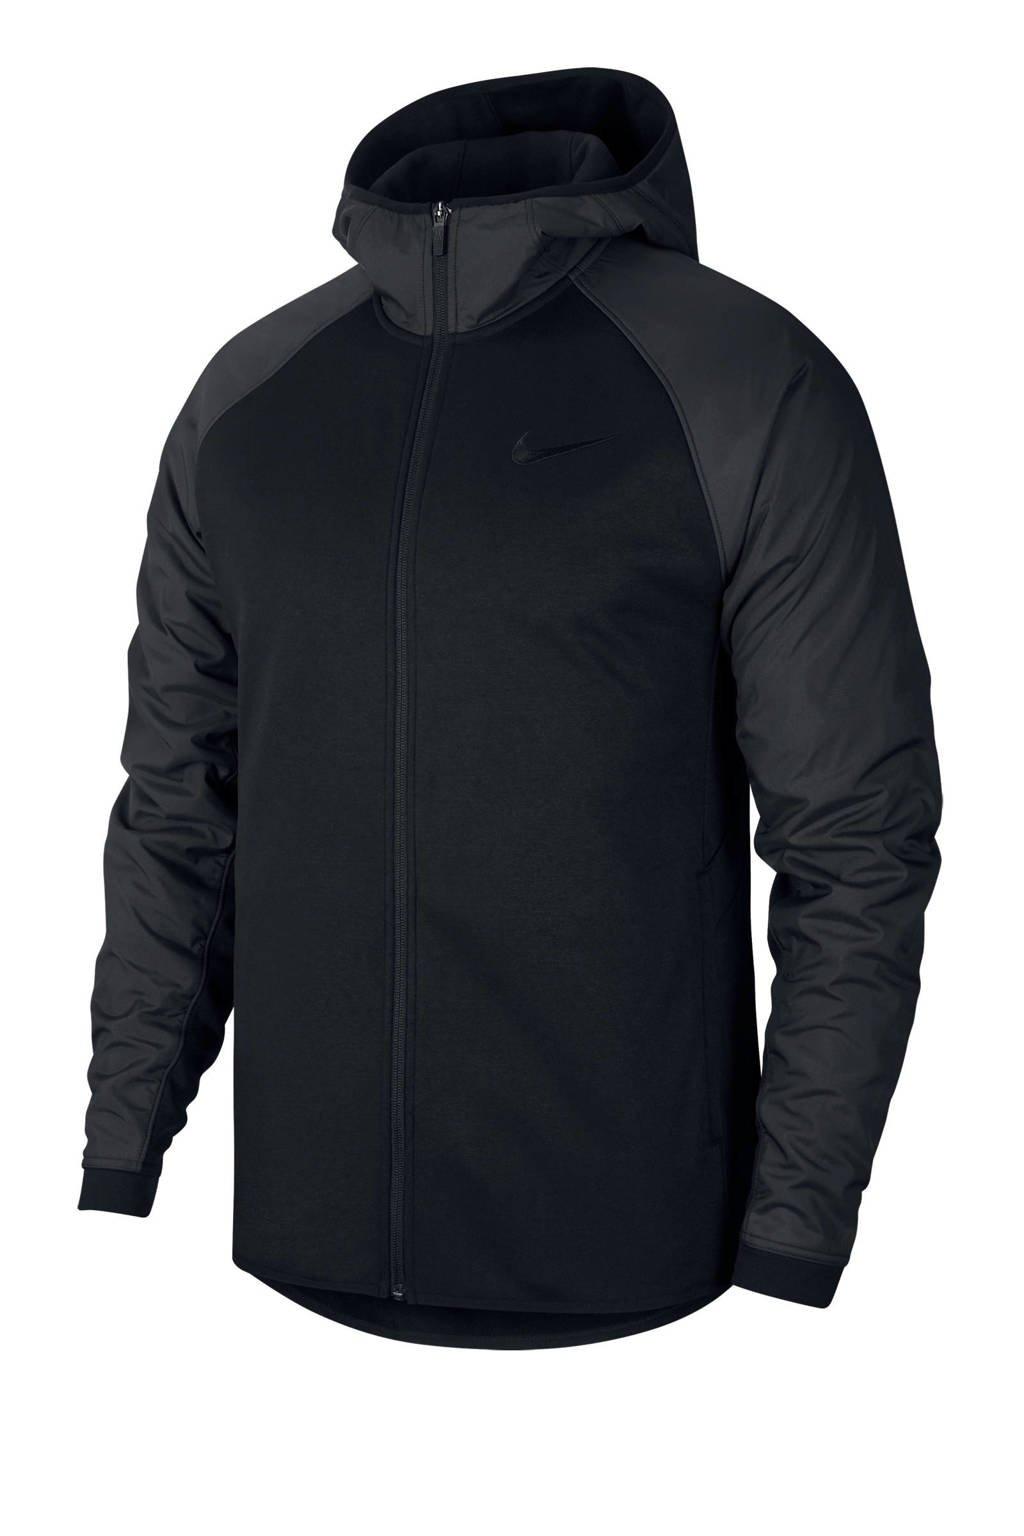 Nike   sportvest zwart, Zwart